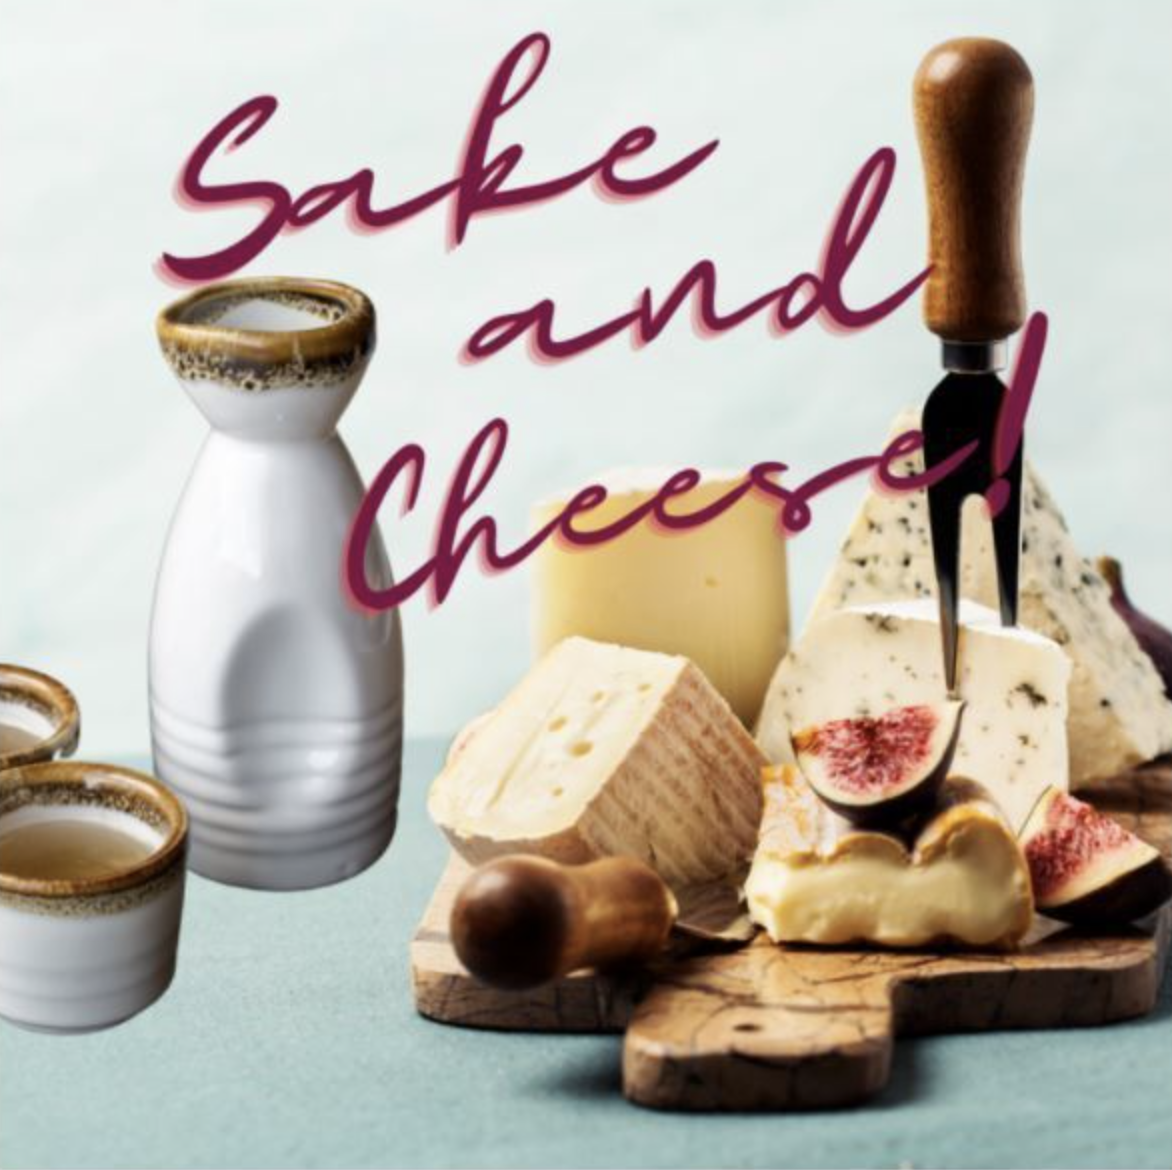 Sake & Cheese at commonwealth wine school